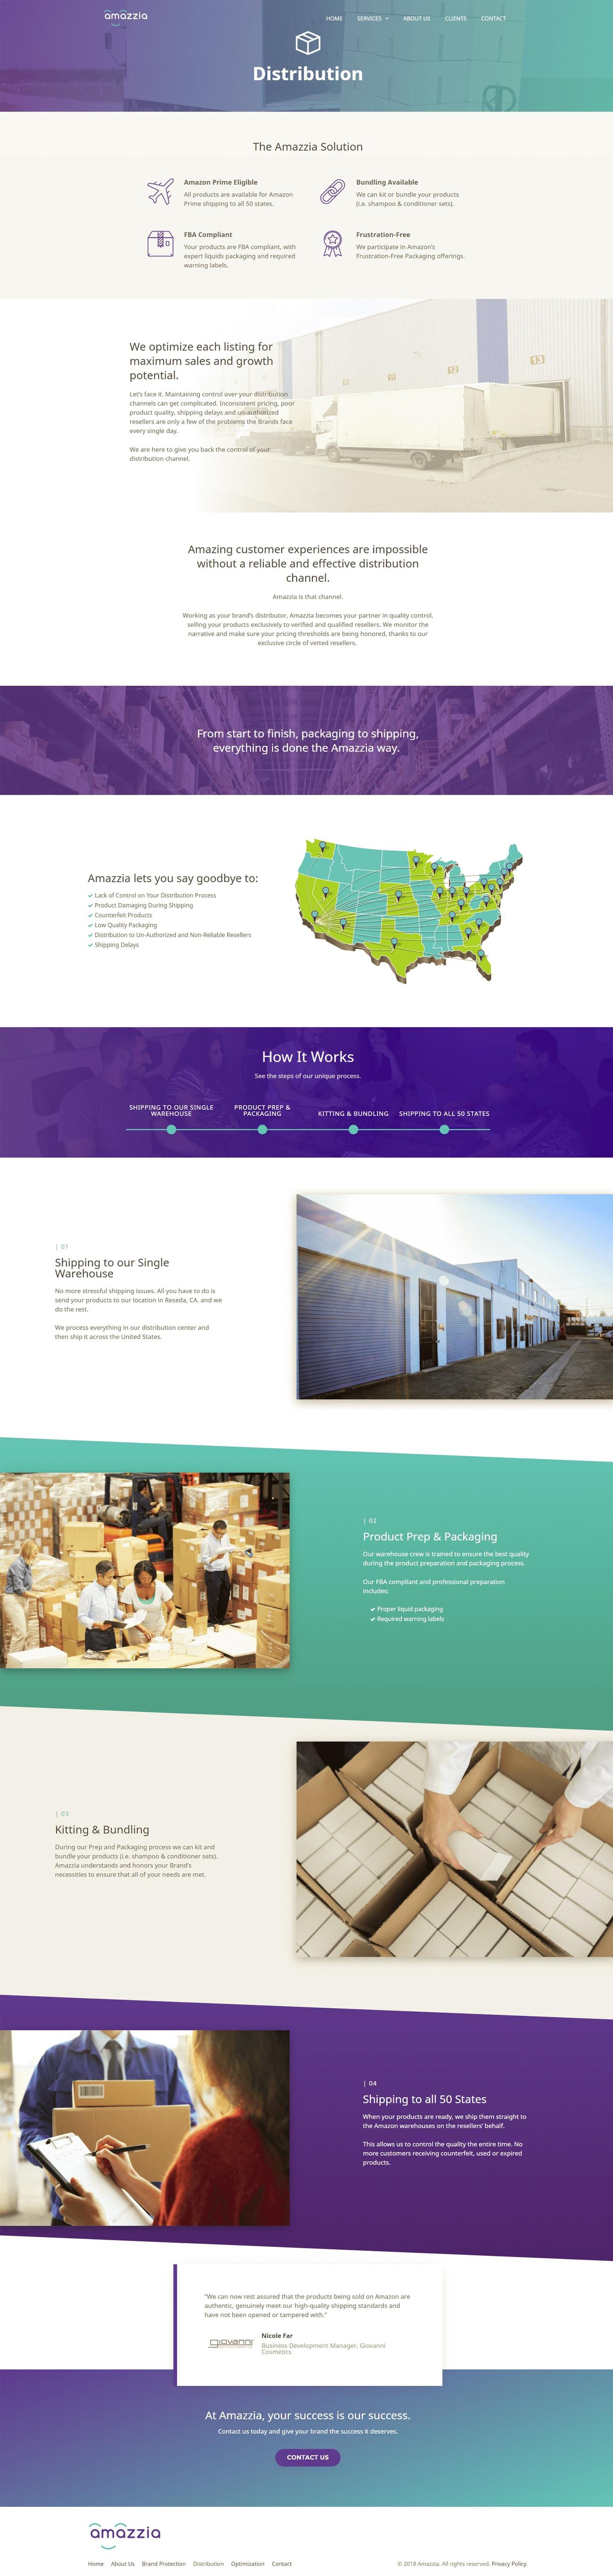 Amazzia Distribution web page design by ali rand